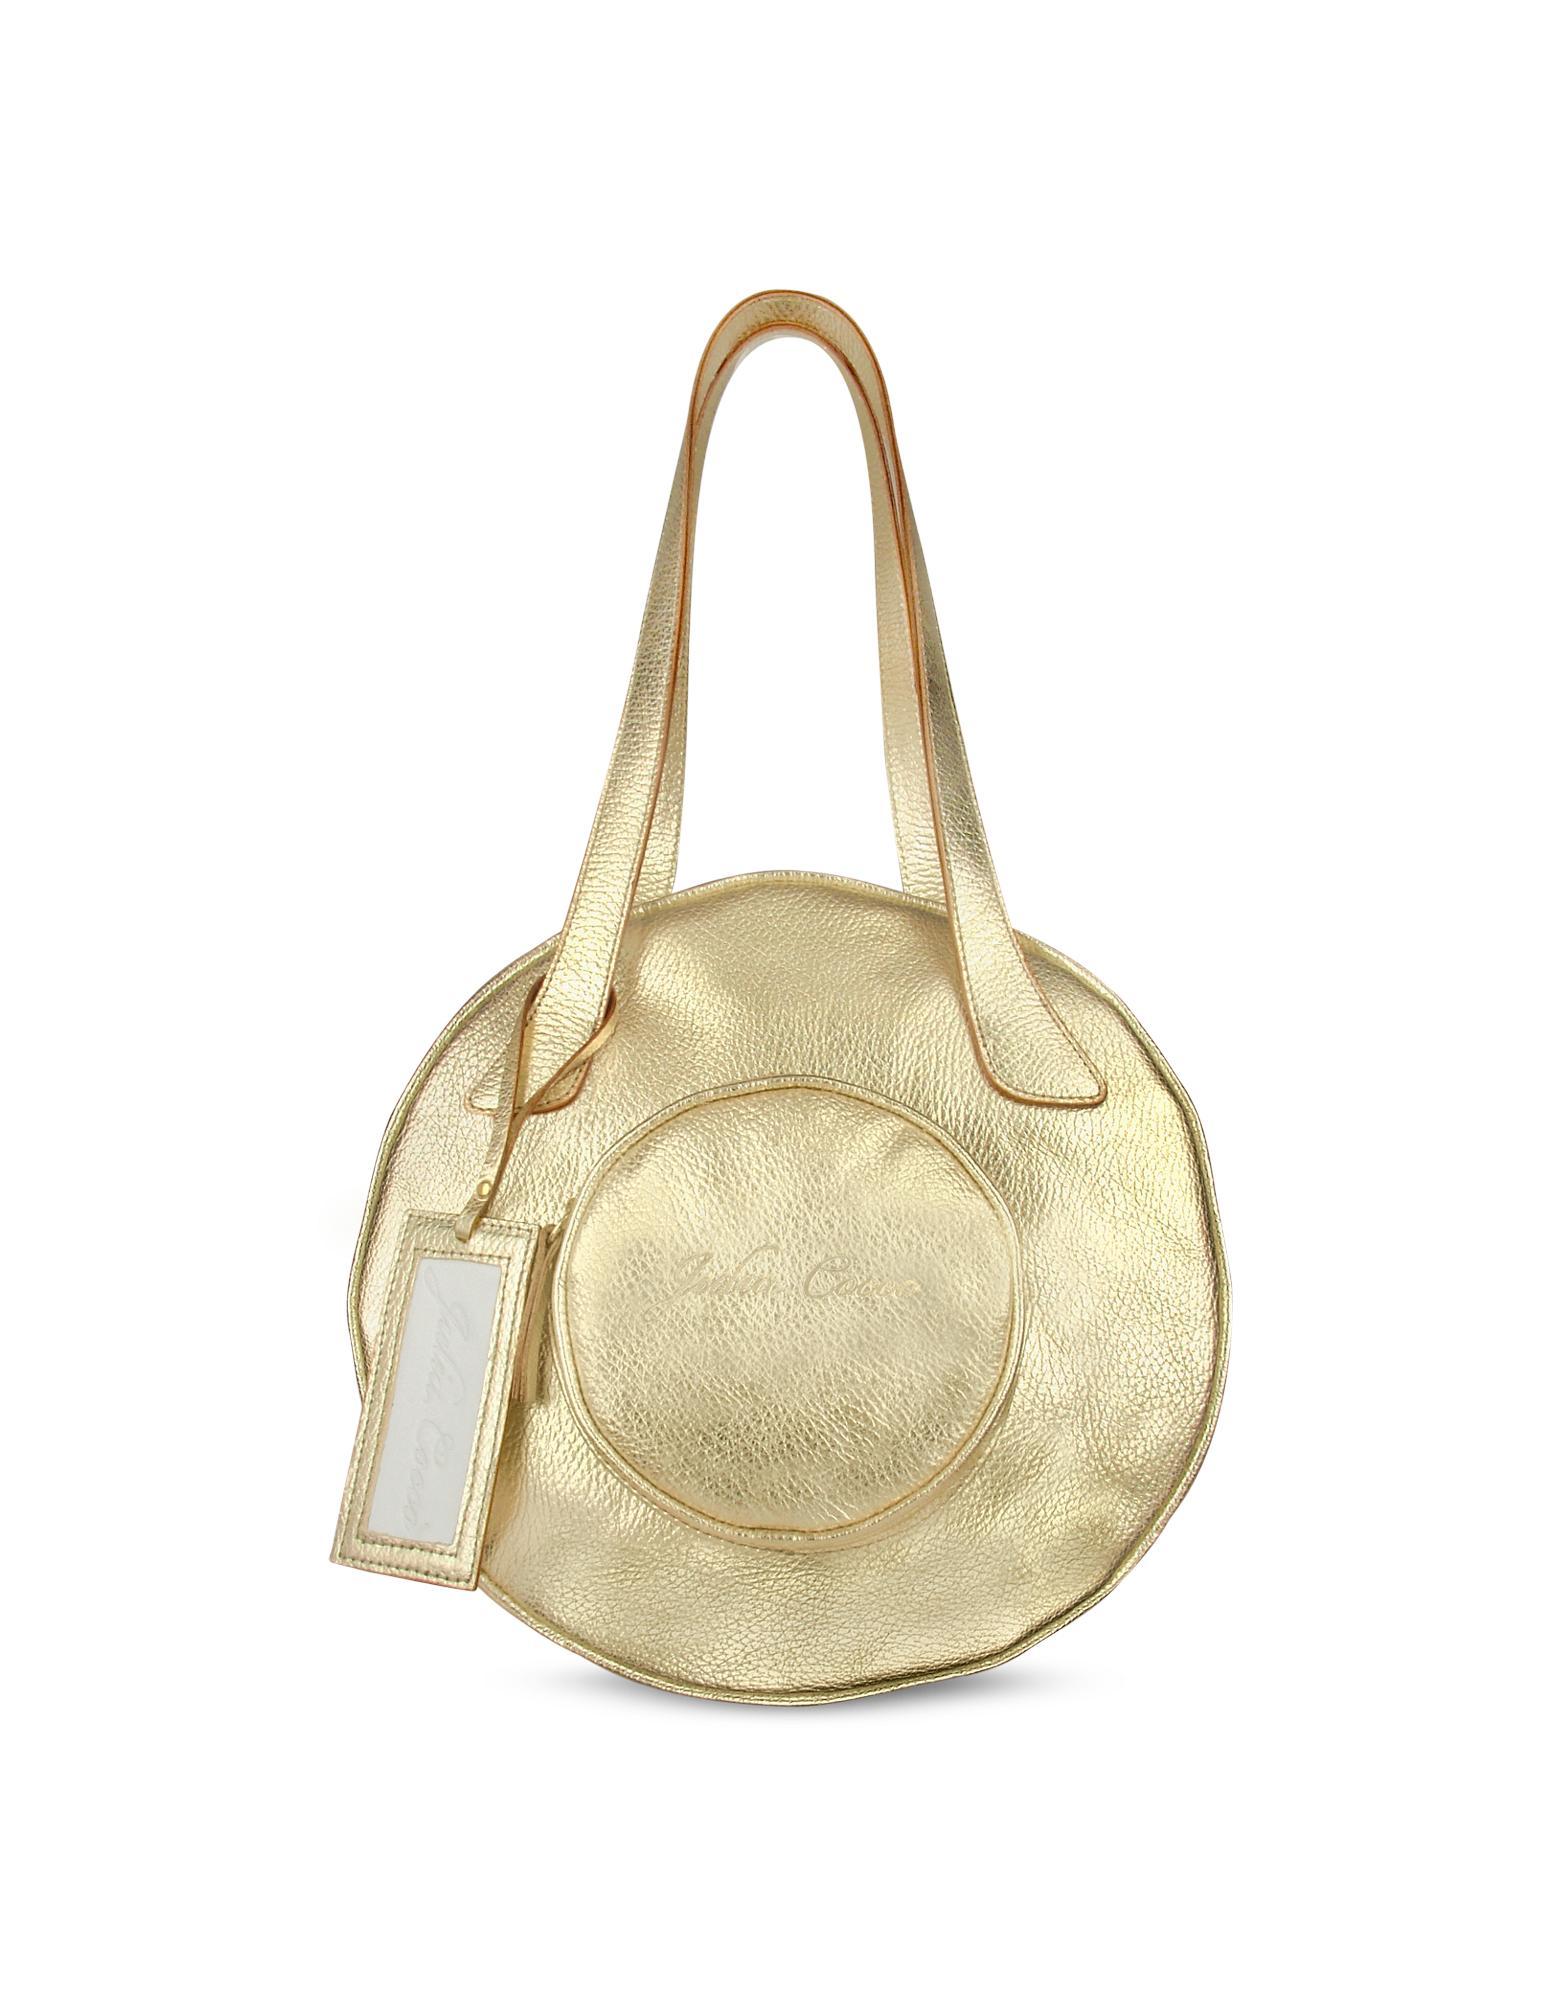 Julia Cocco' Metallic Gold Pebbled Leather Round Tote Bag